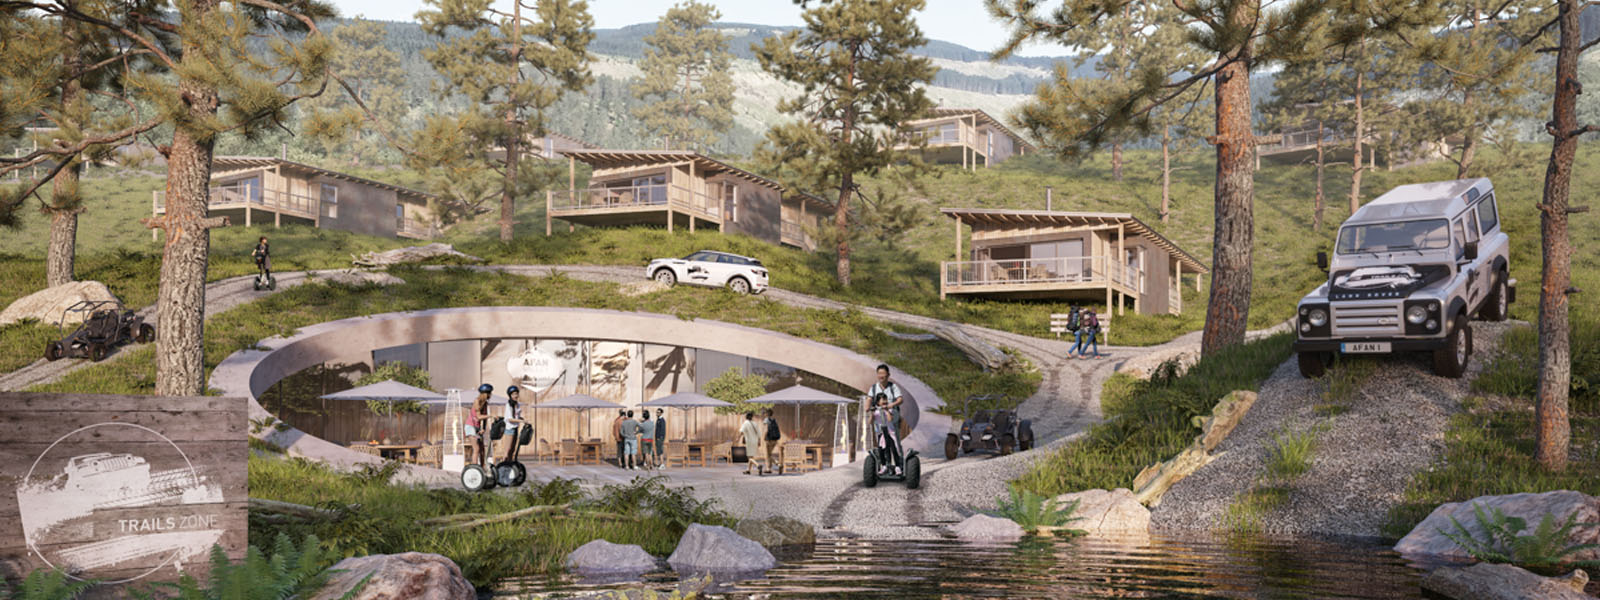 Afan Valley Adventure Resort Lodges